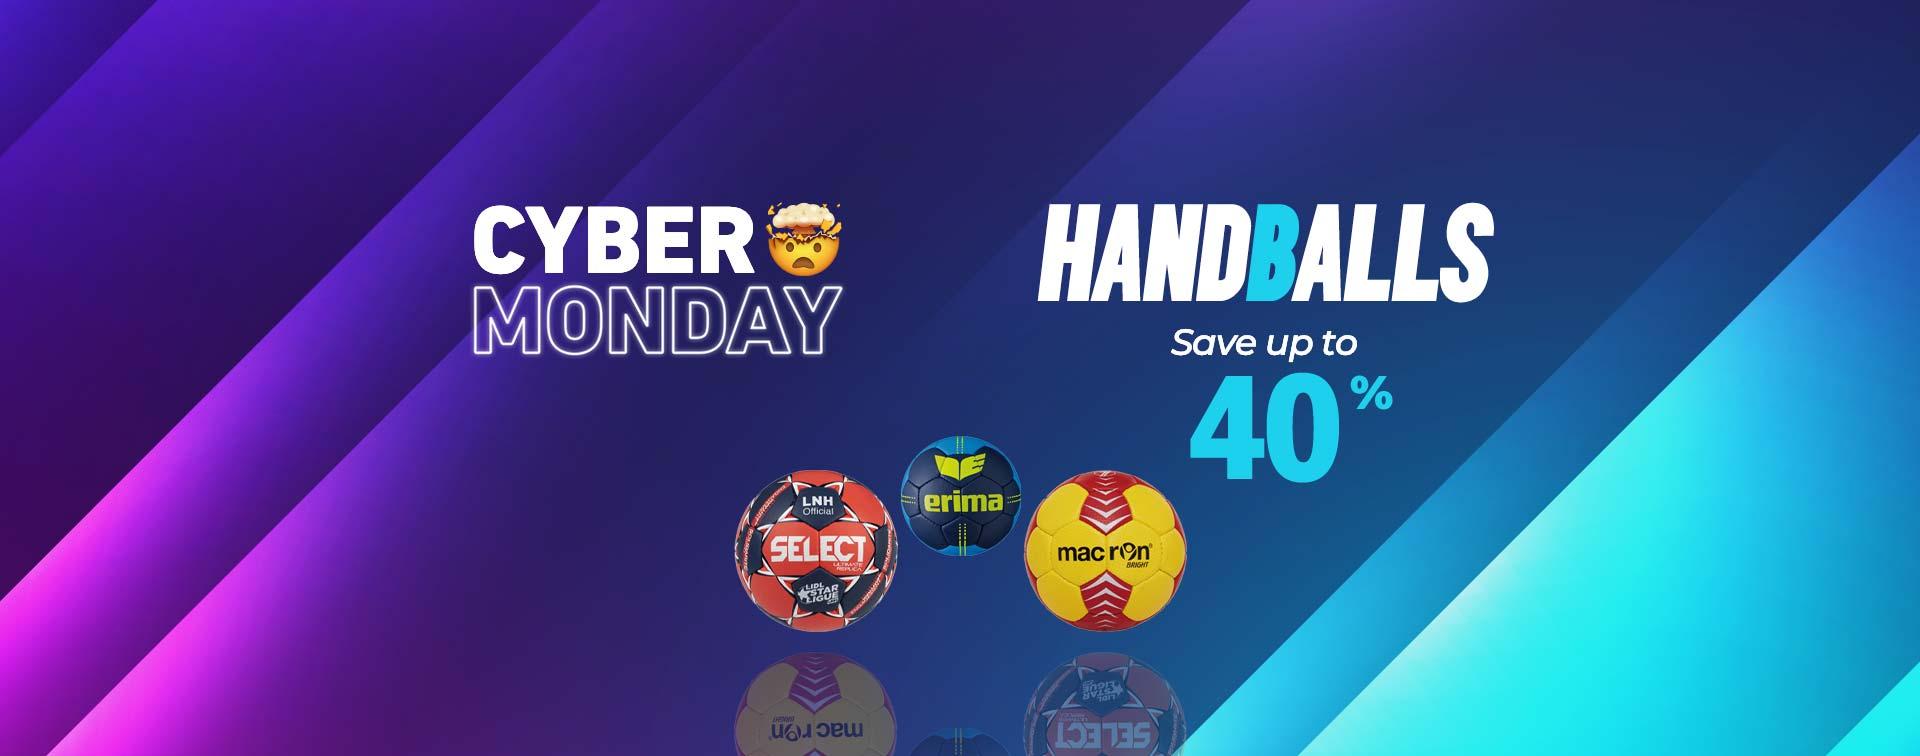 Cyber Monday handballs